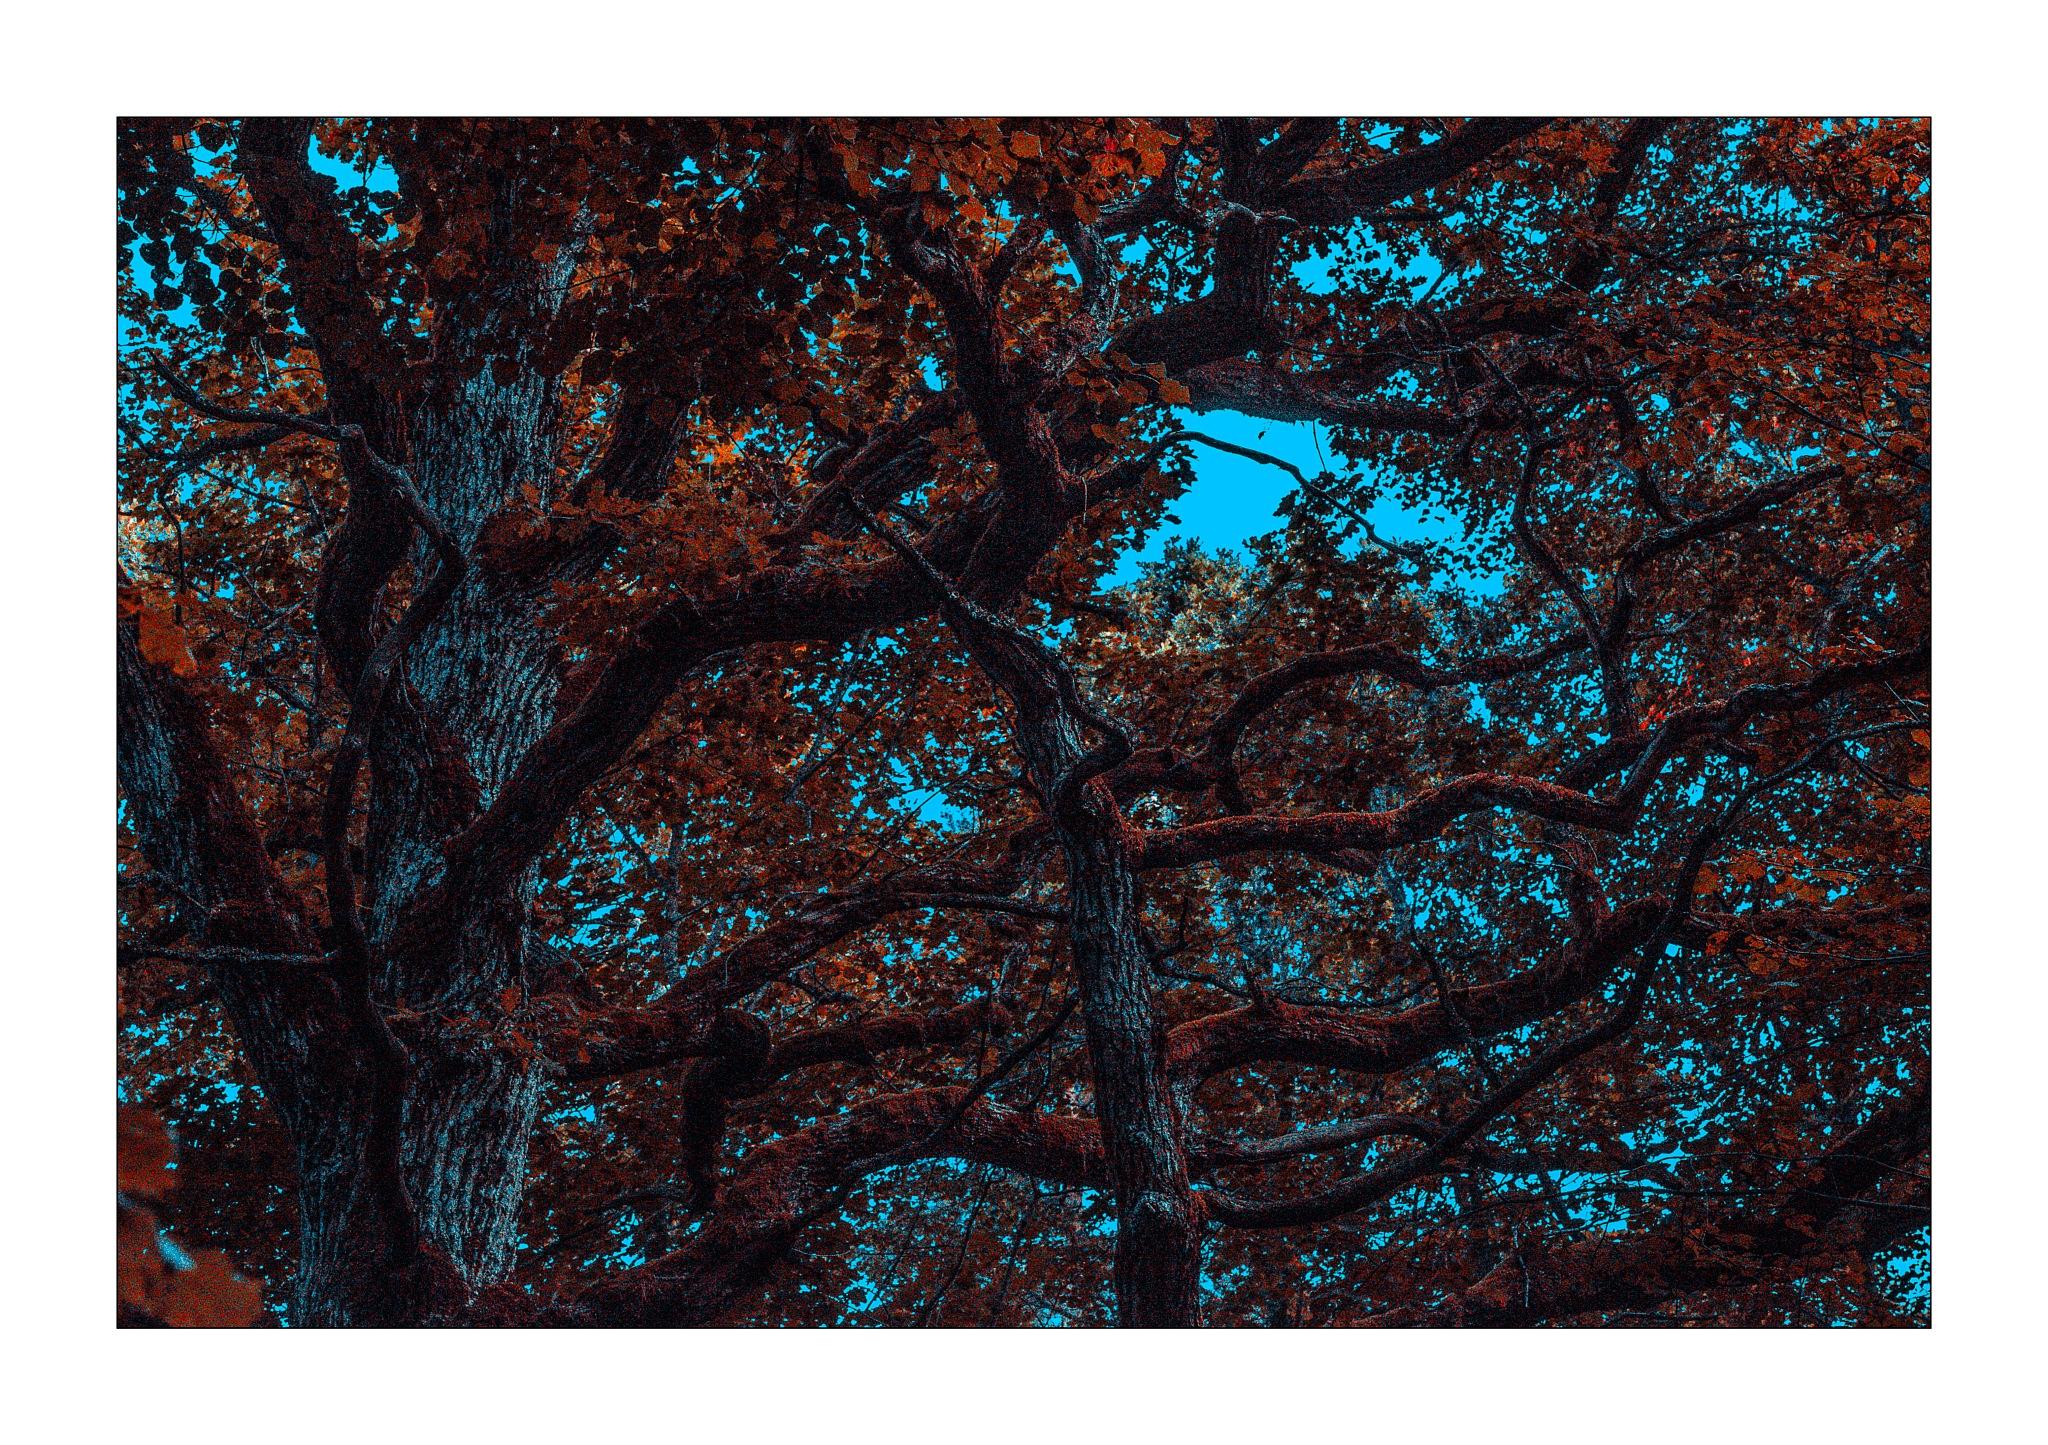 OLD WISE TREE by Goran Jorganovich